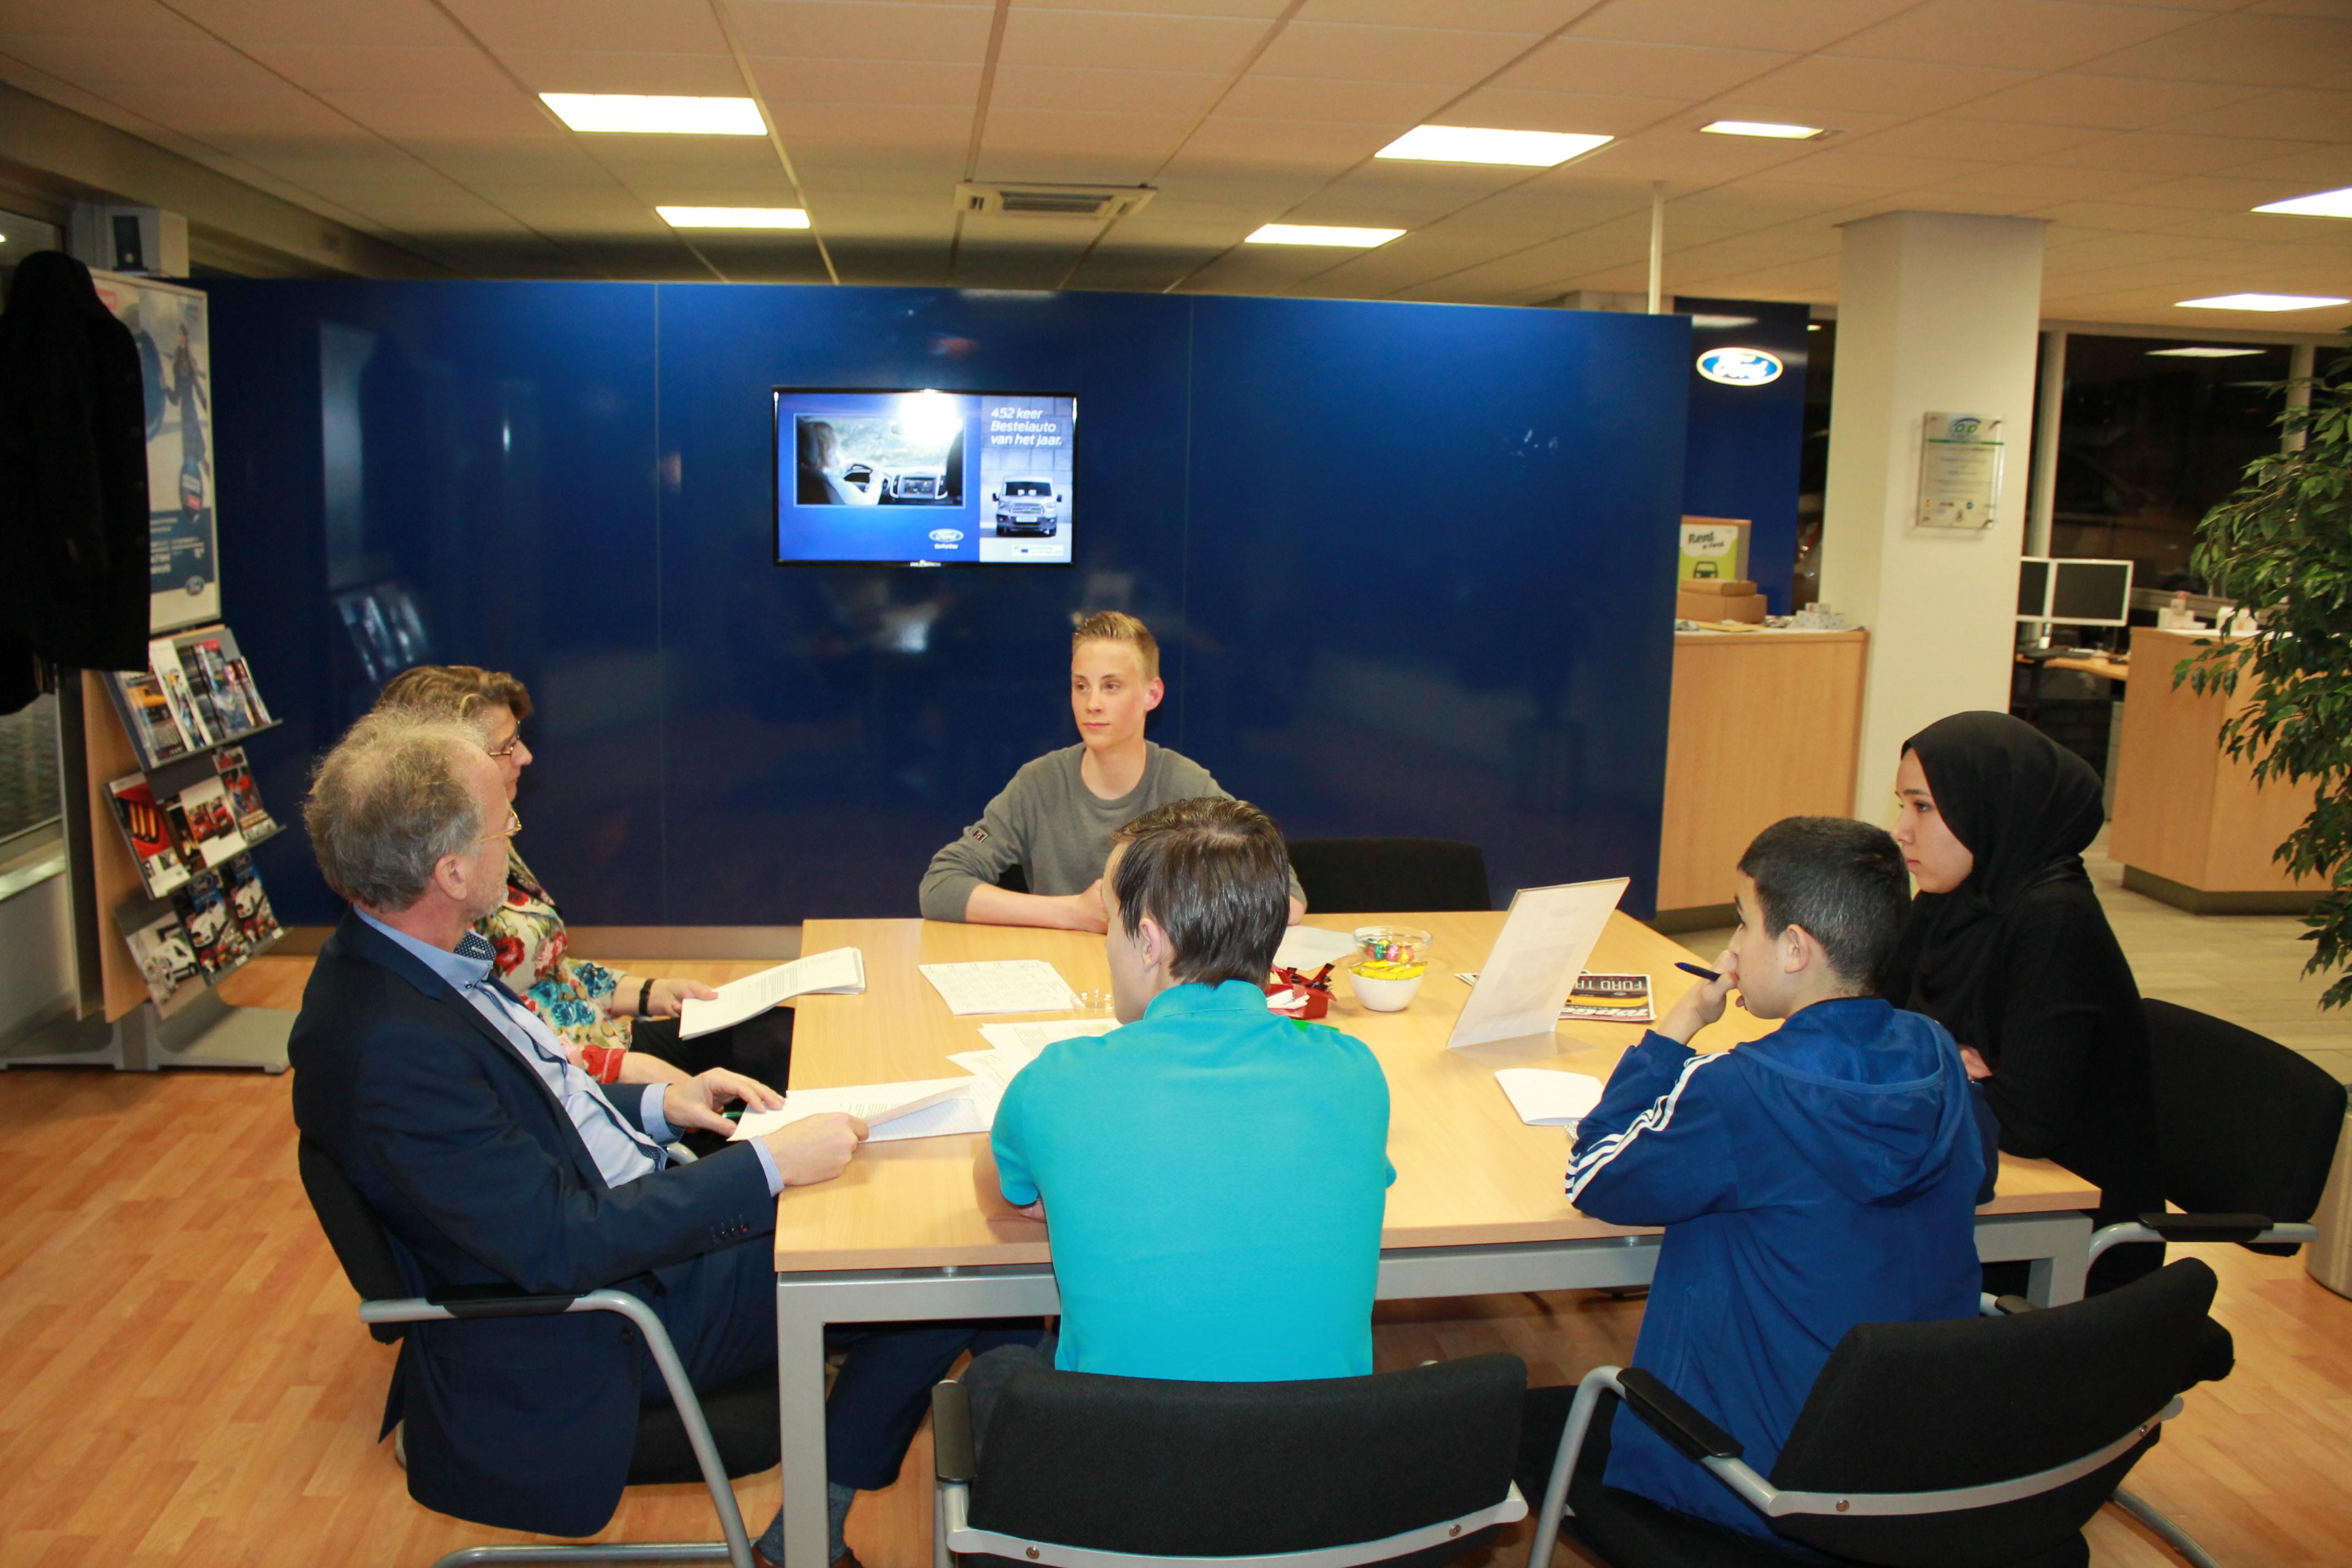 sollicitatiebrief scholieren Rotary Schoonhoven geeft sollicitatietraining aan scholieren   RTV  sollicitatiebrief scholieren